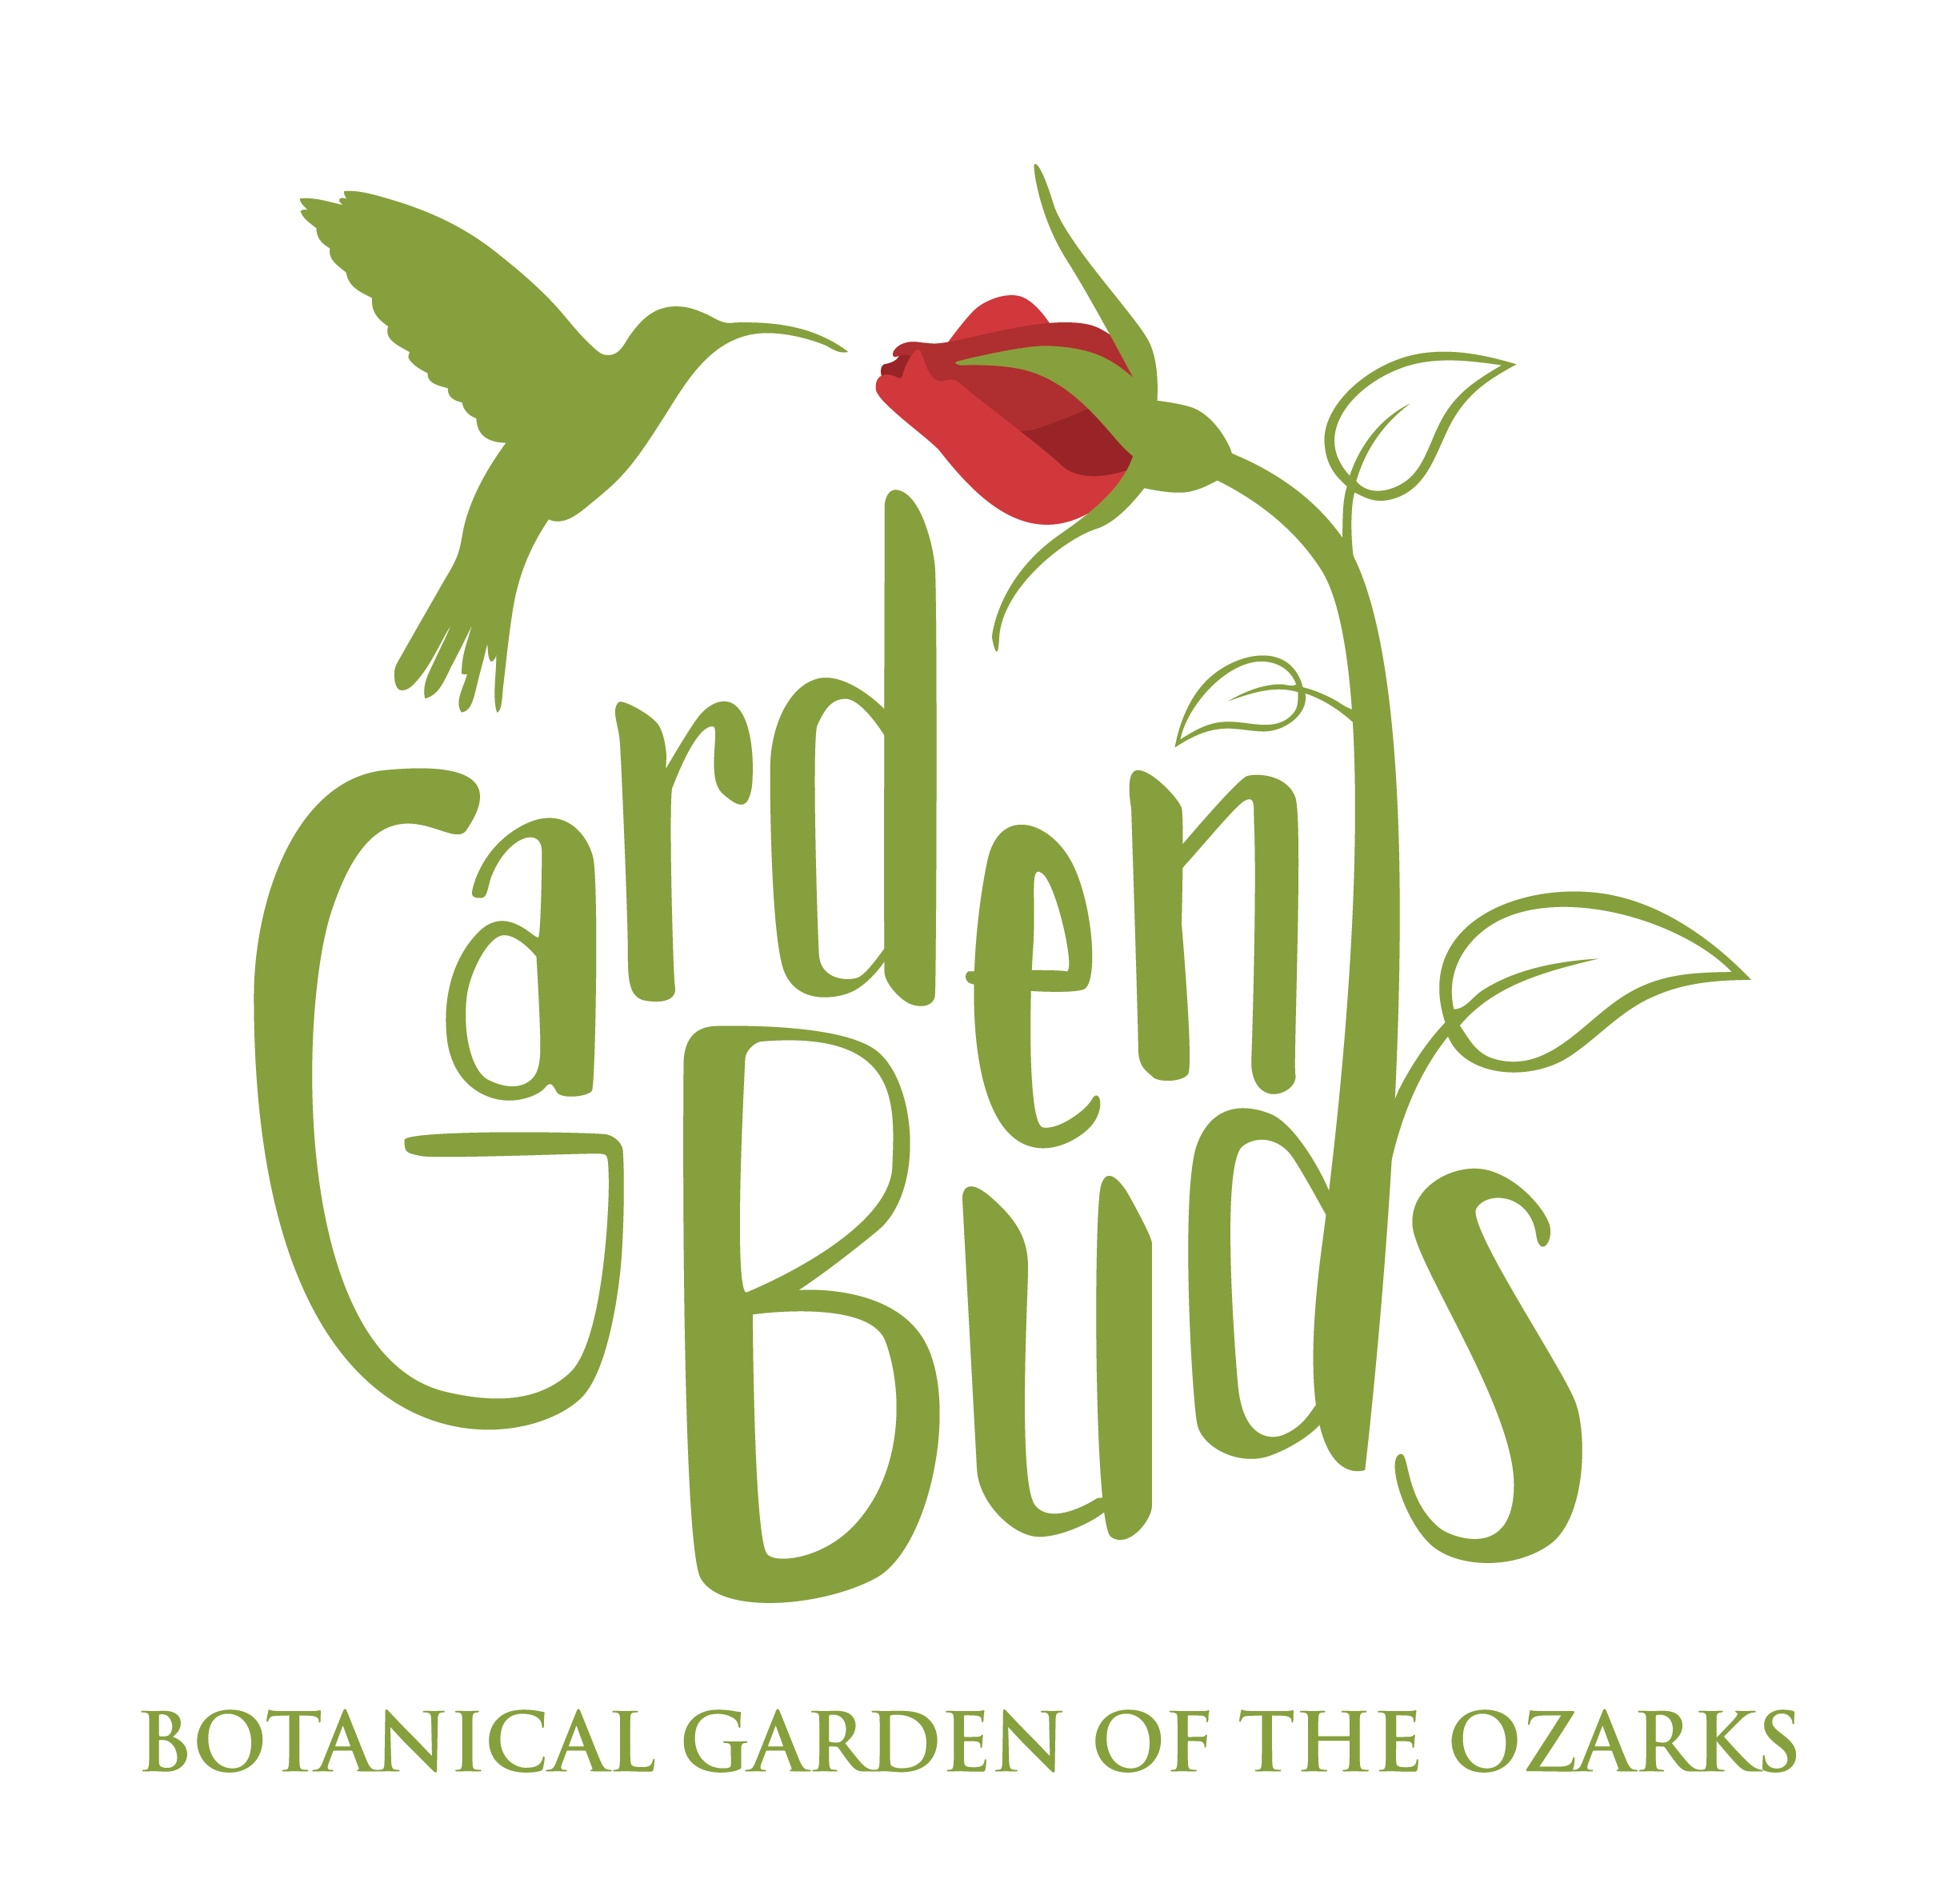 Garden Buds Botanical Garden Of The Ozarks